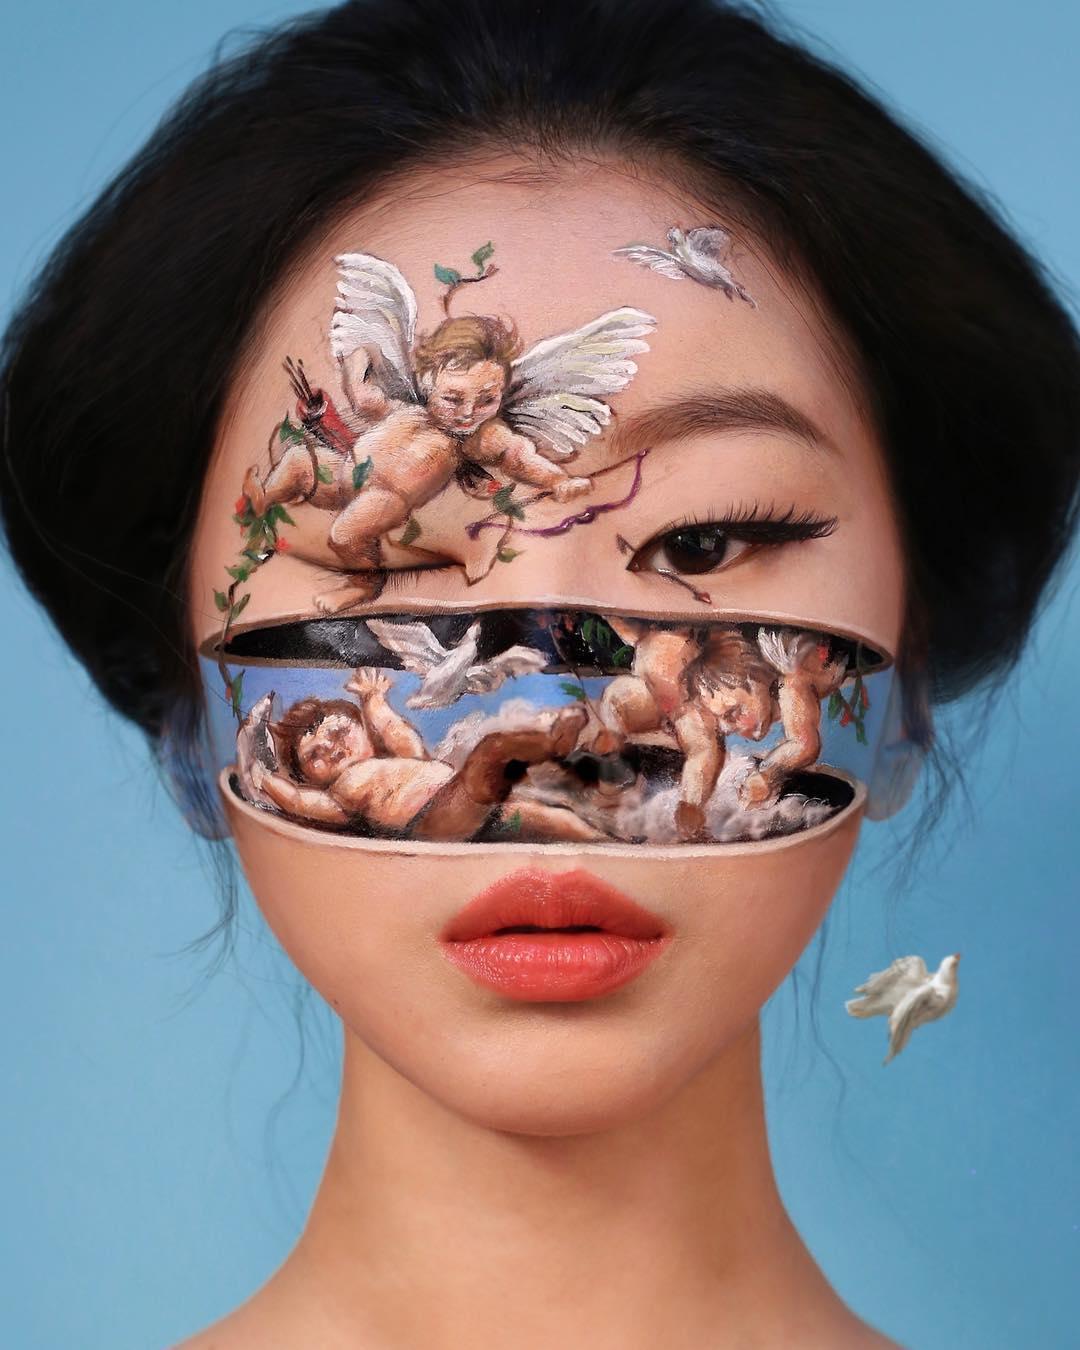 dain-yoon-art-20-1557519488291.jpg